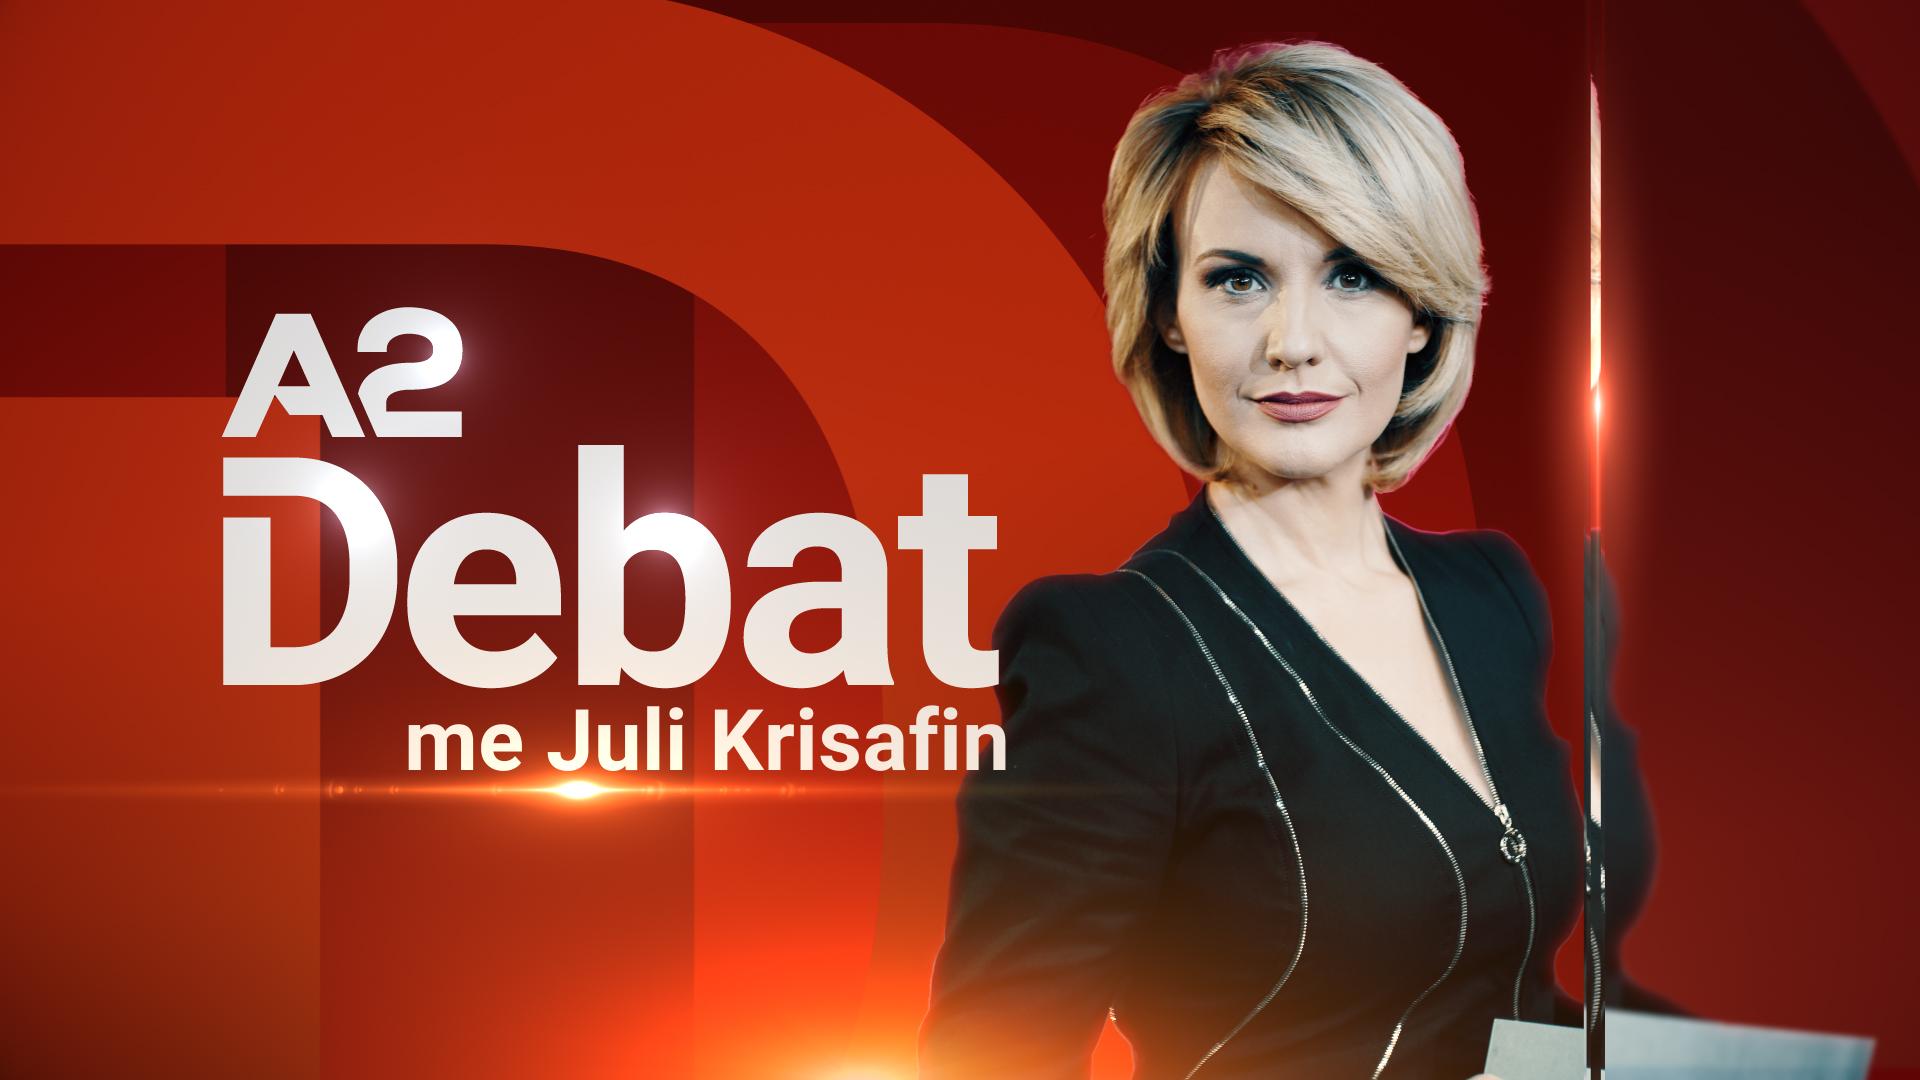 A2_Debat_Design_CNN_Albania_Renderon2.jpg